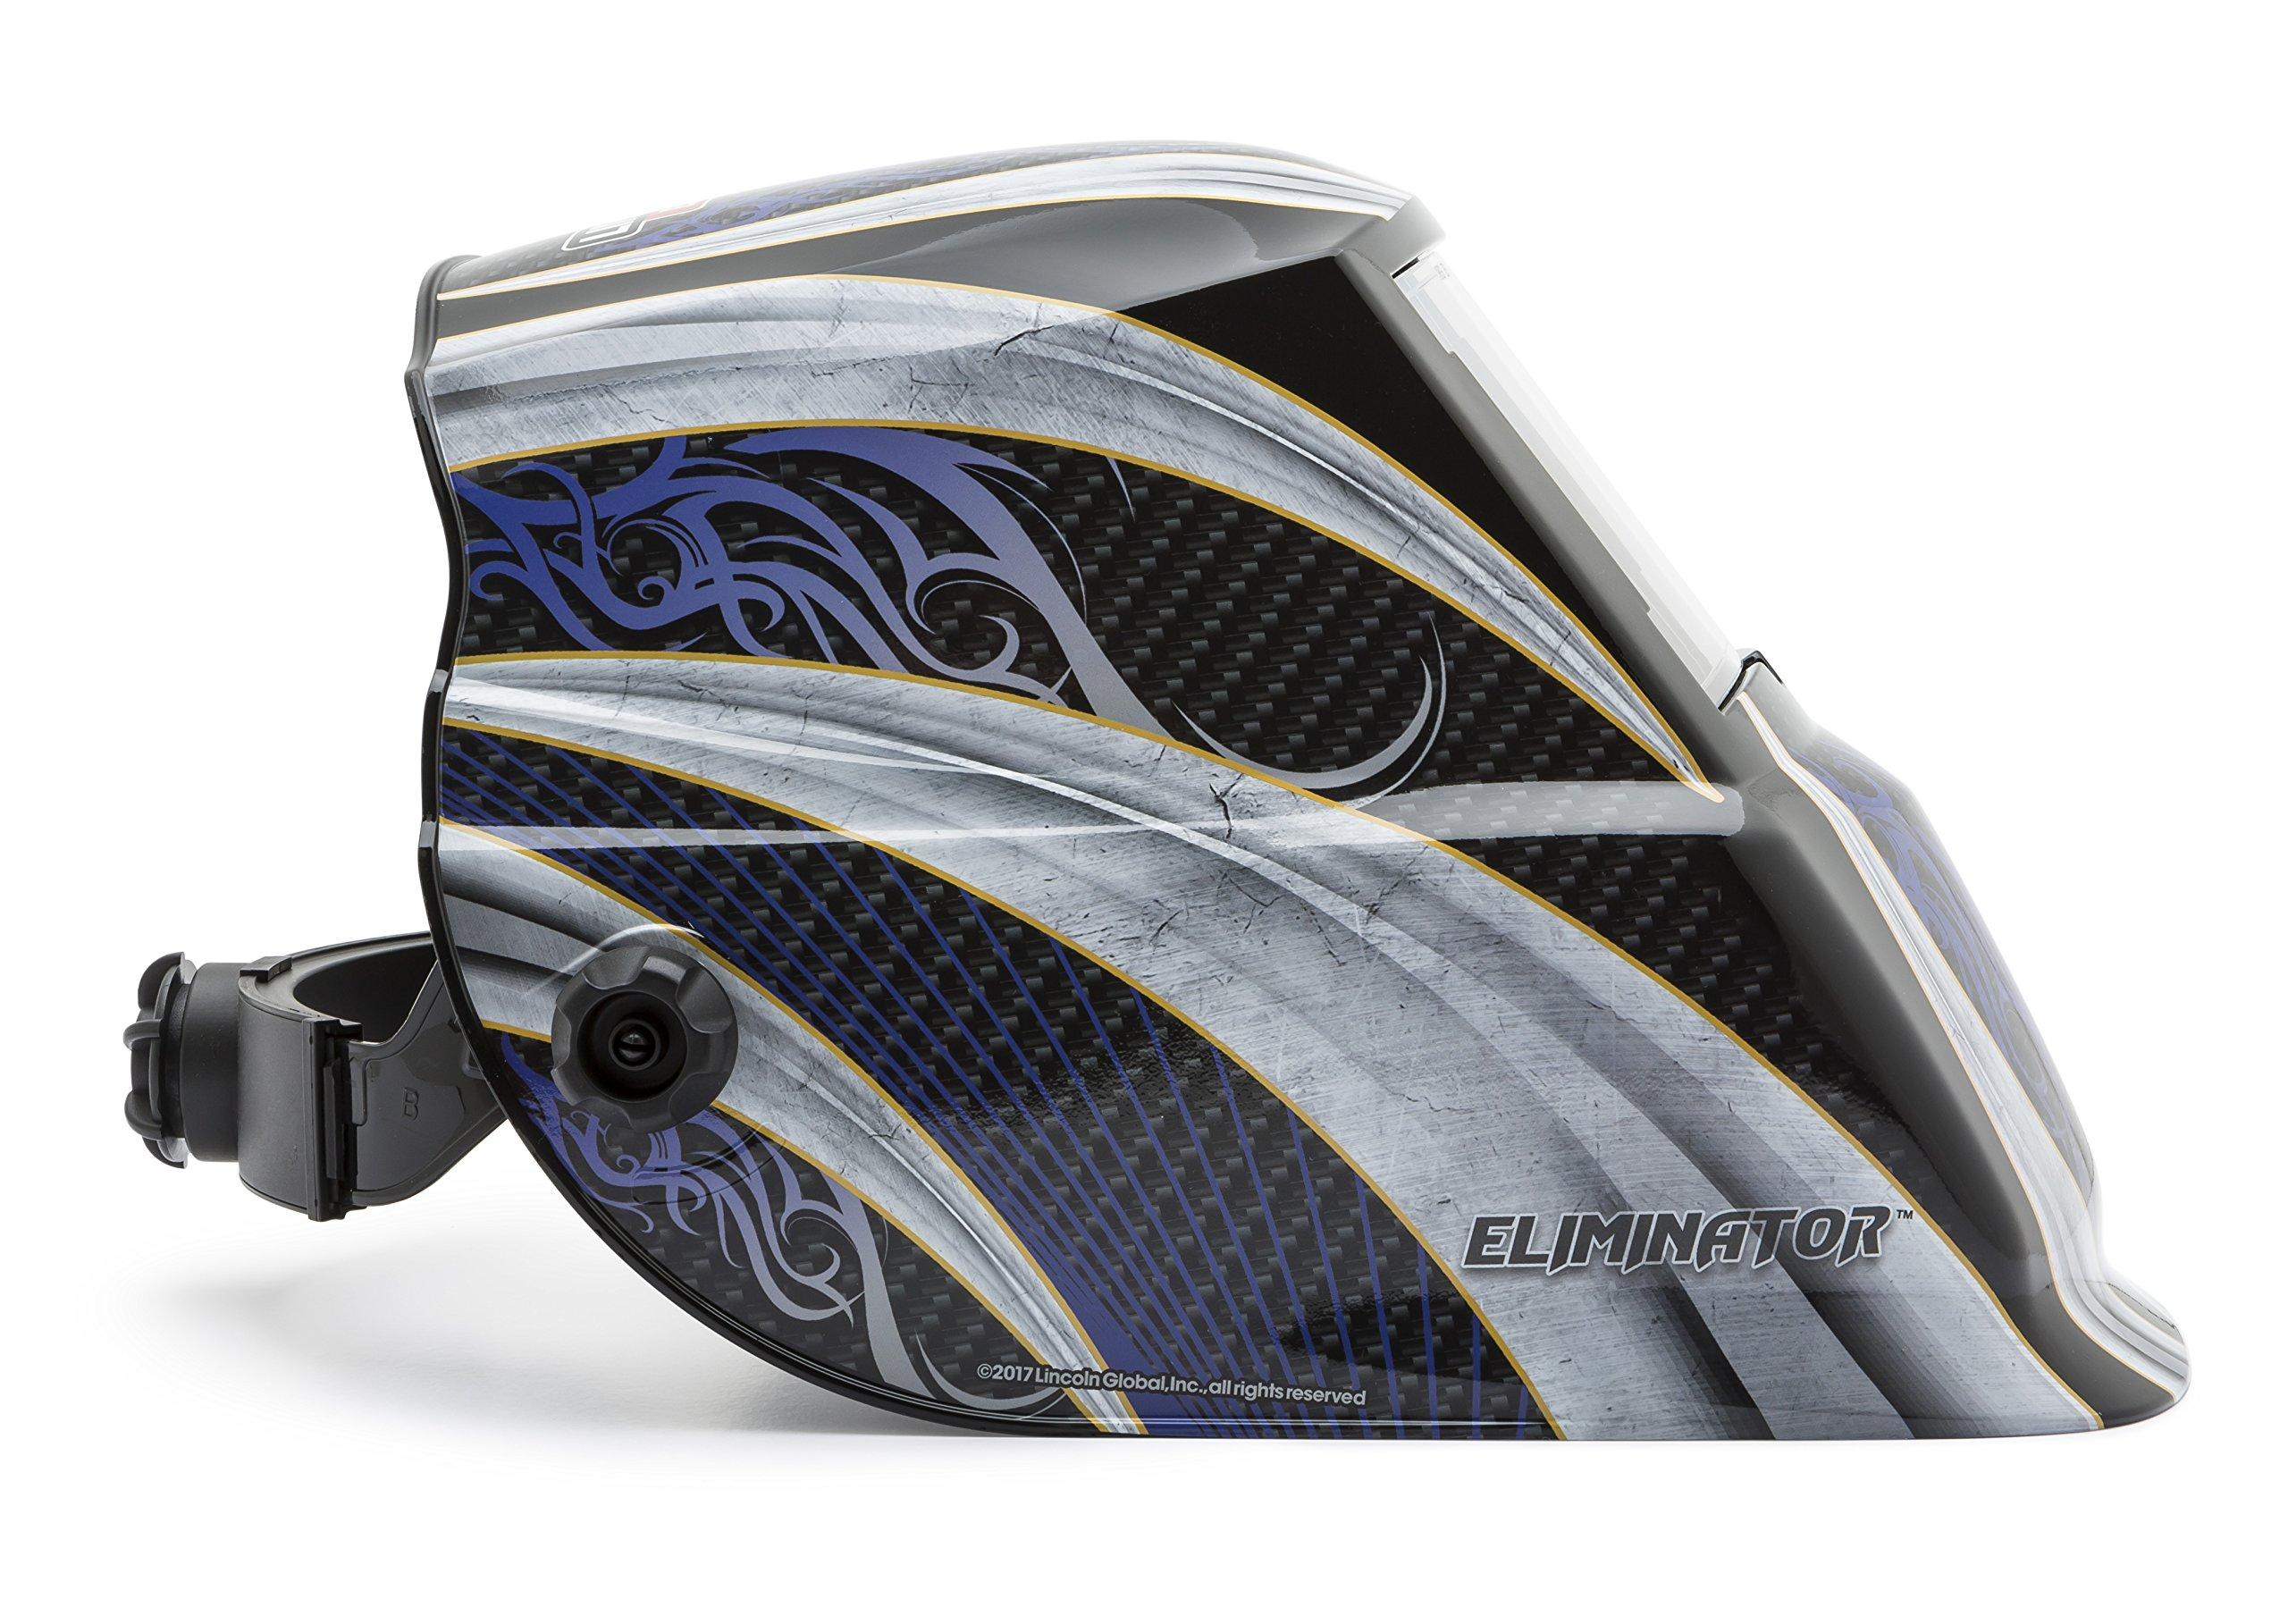 Lincoln Electric K3320-2 Eliminator VAR Sh 7-13 ADF Helmet, Capacity, Volume, Polycarbonate, 11.12 x 10.25 x 11.87, Black ( by Lincoln Electric (Image #7)